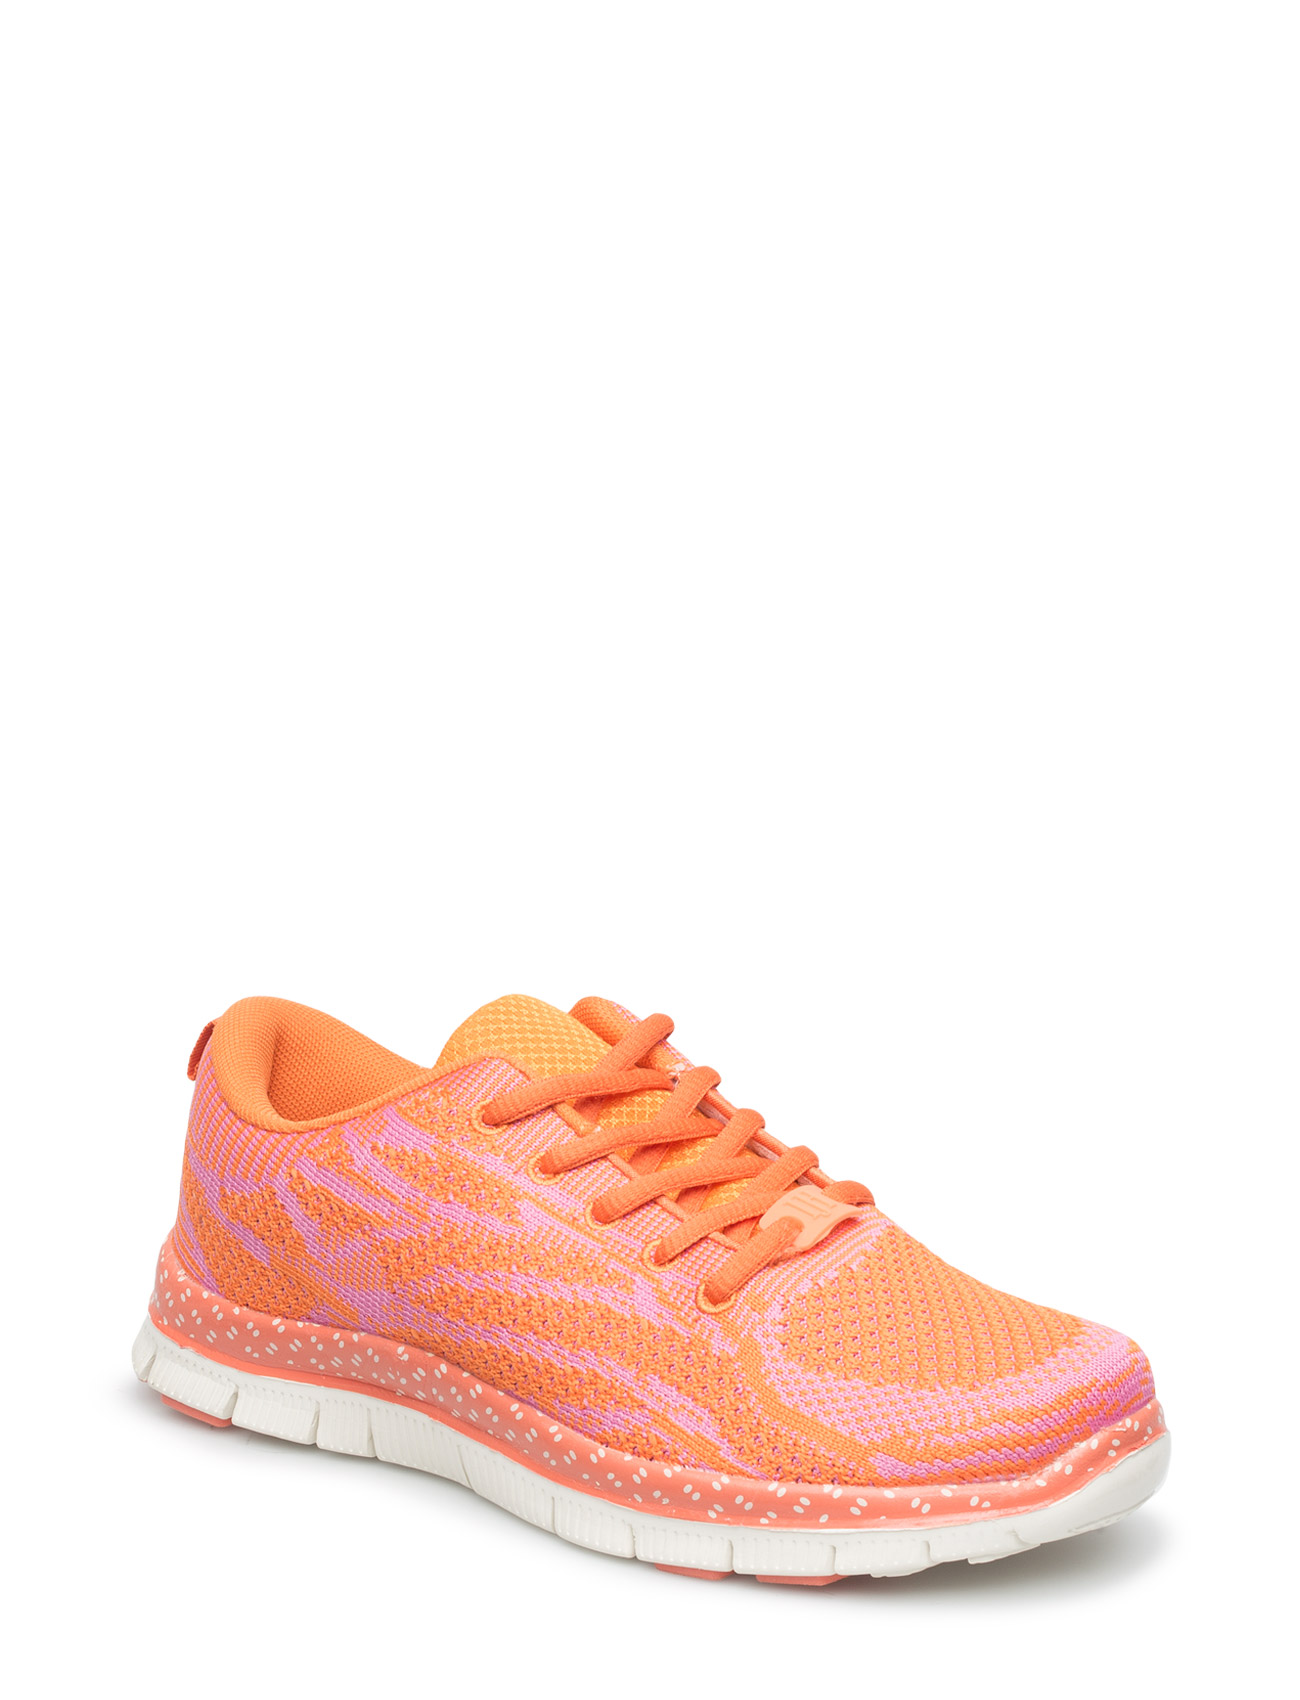 Peony202 Ilse Jacobsen Sneakers til Kvinder i